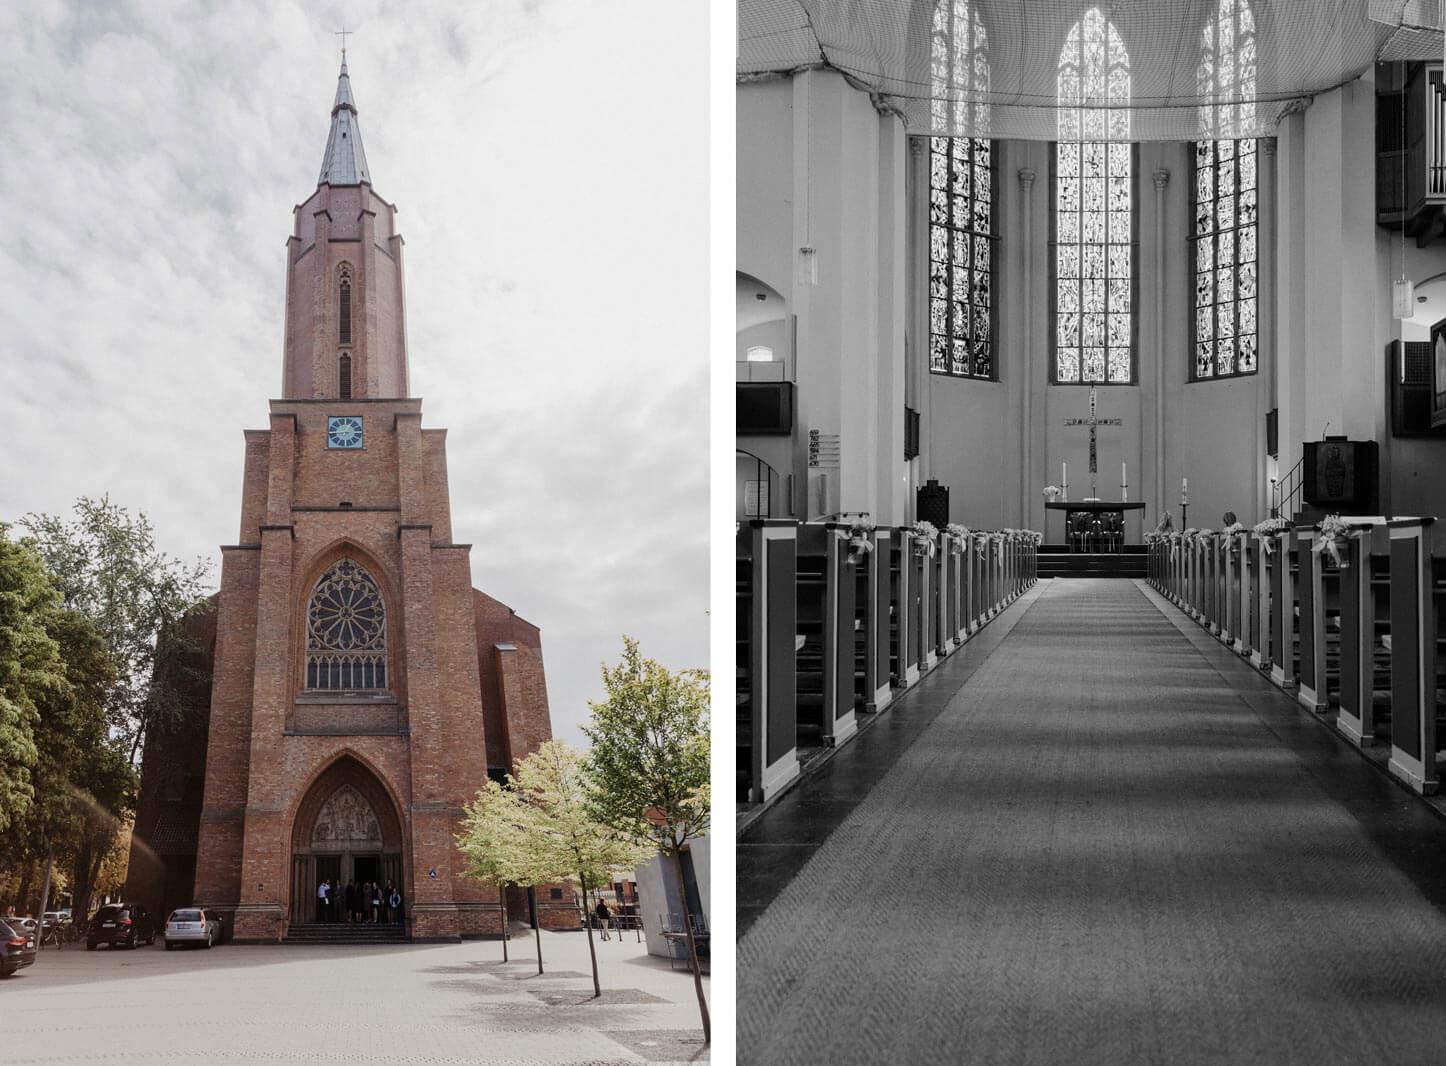 Kreuzkirche in Bonn